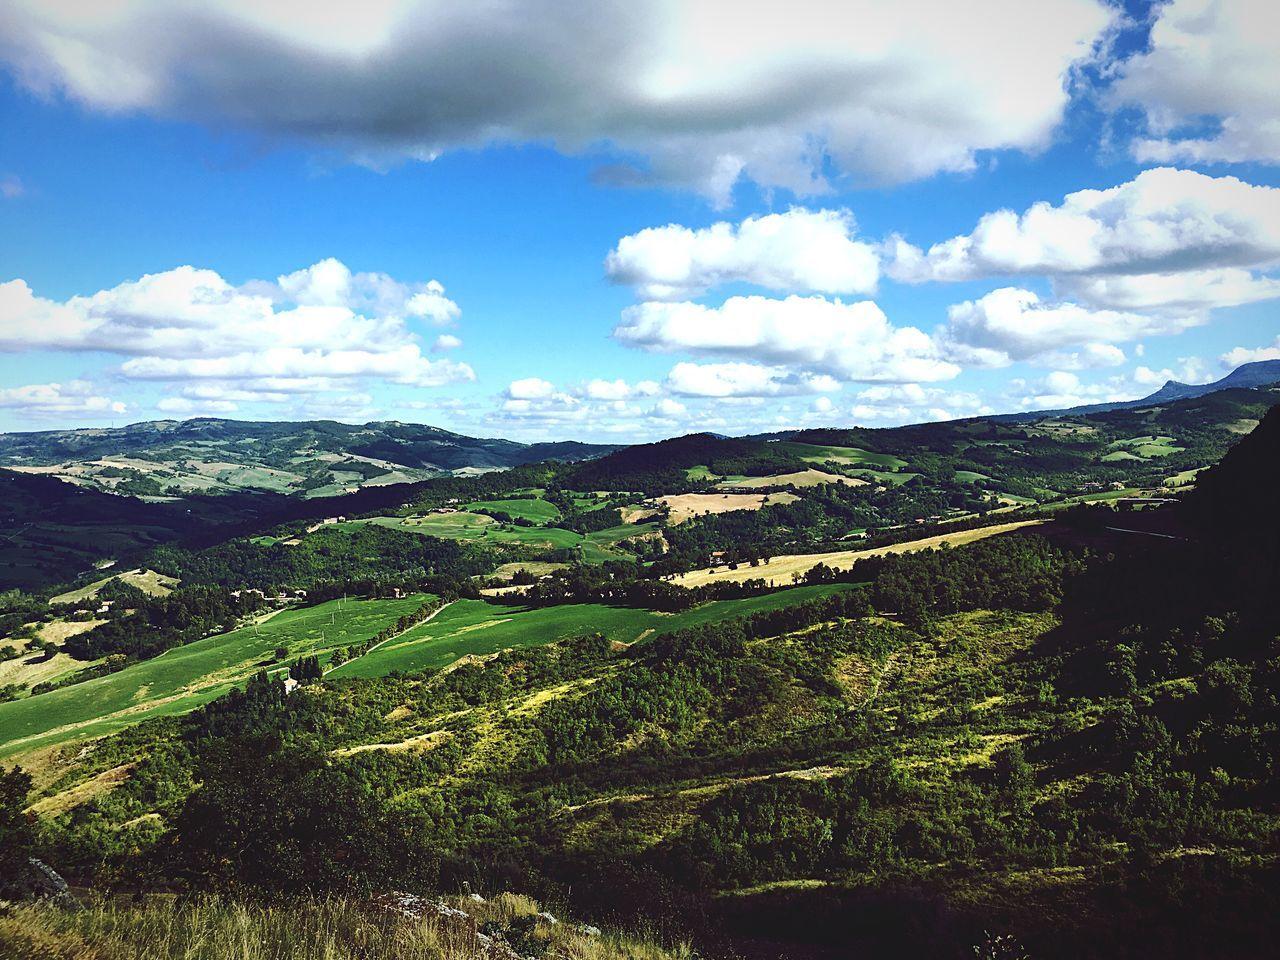 Scenics Landscape Sanleo Outdoor Photography Travel Emiliaromagna Montefeltro